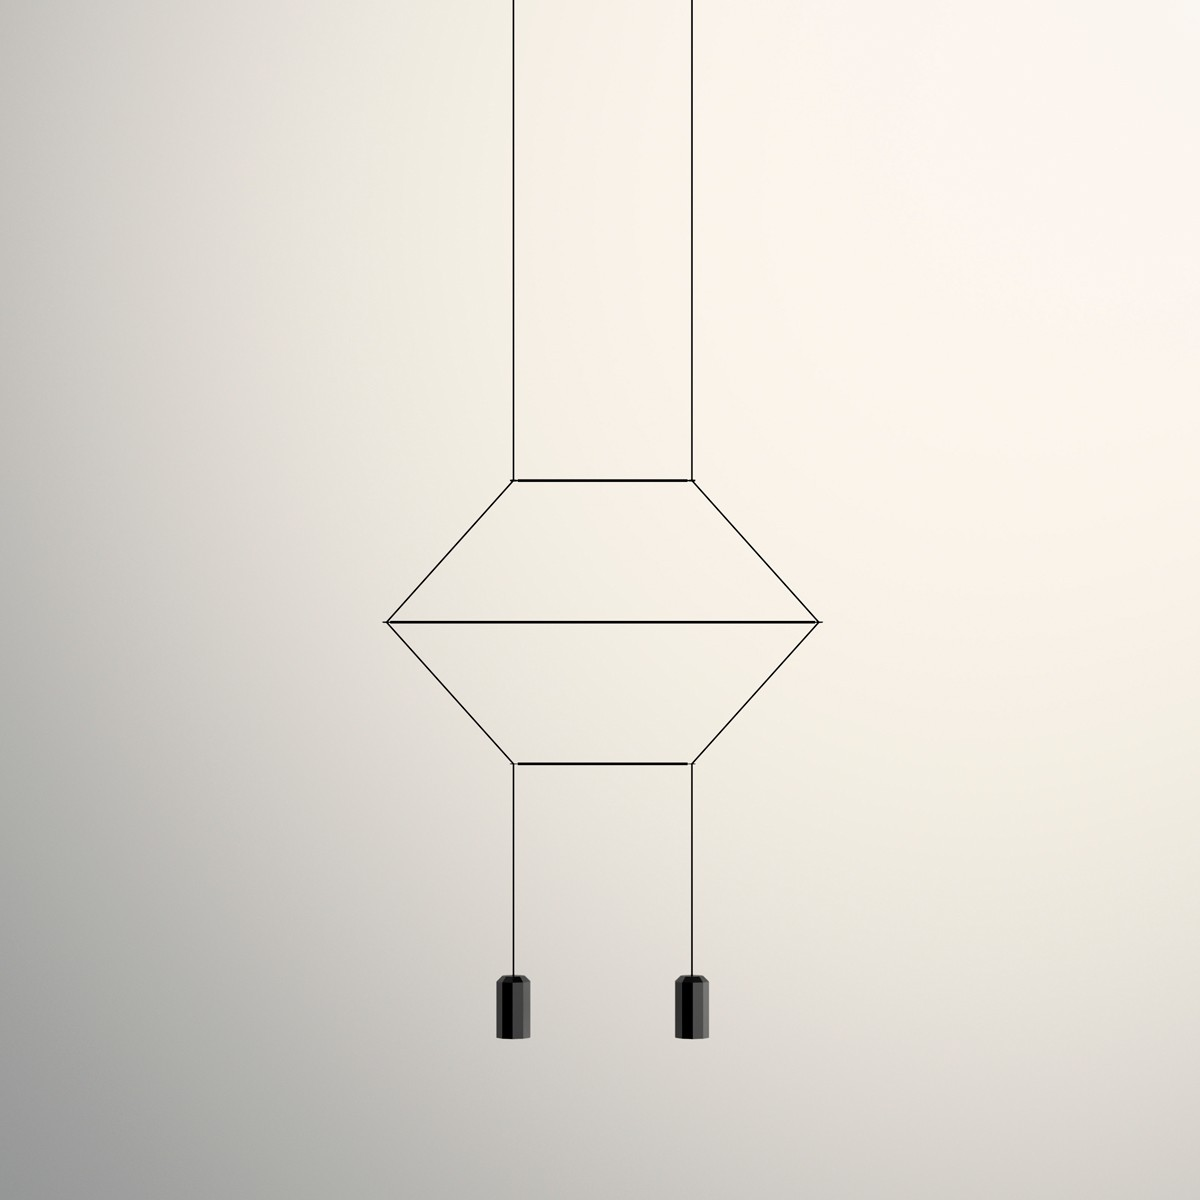 Vibia Wireflow Pendelleuchte, linear, 2-flg., schwarz